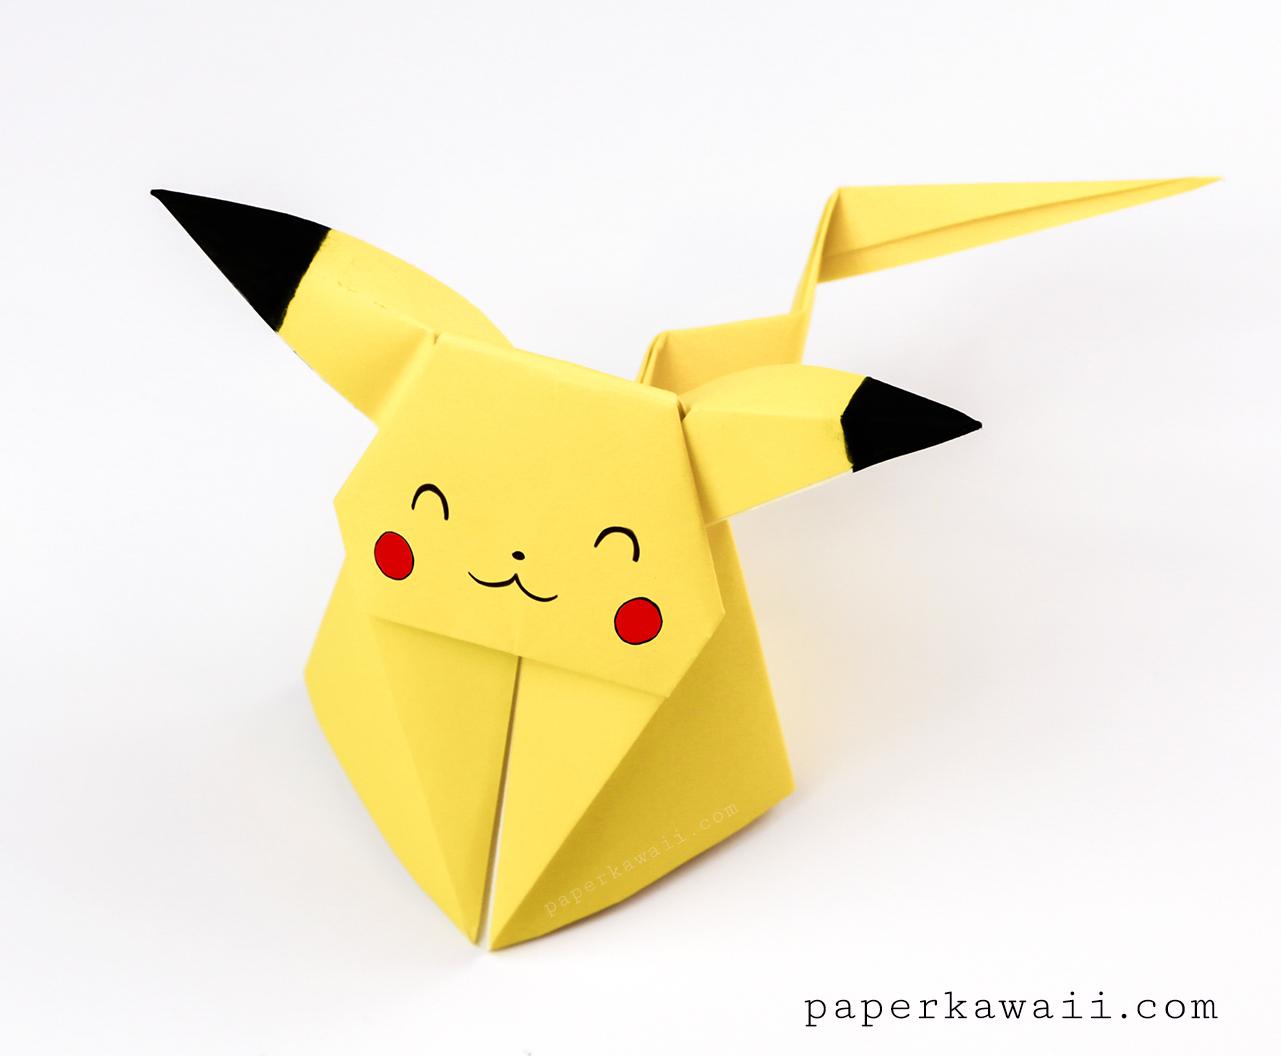 origami-pikachu-tutorial-paper-kawaii-04-1